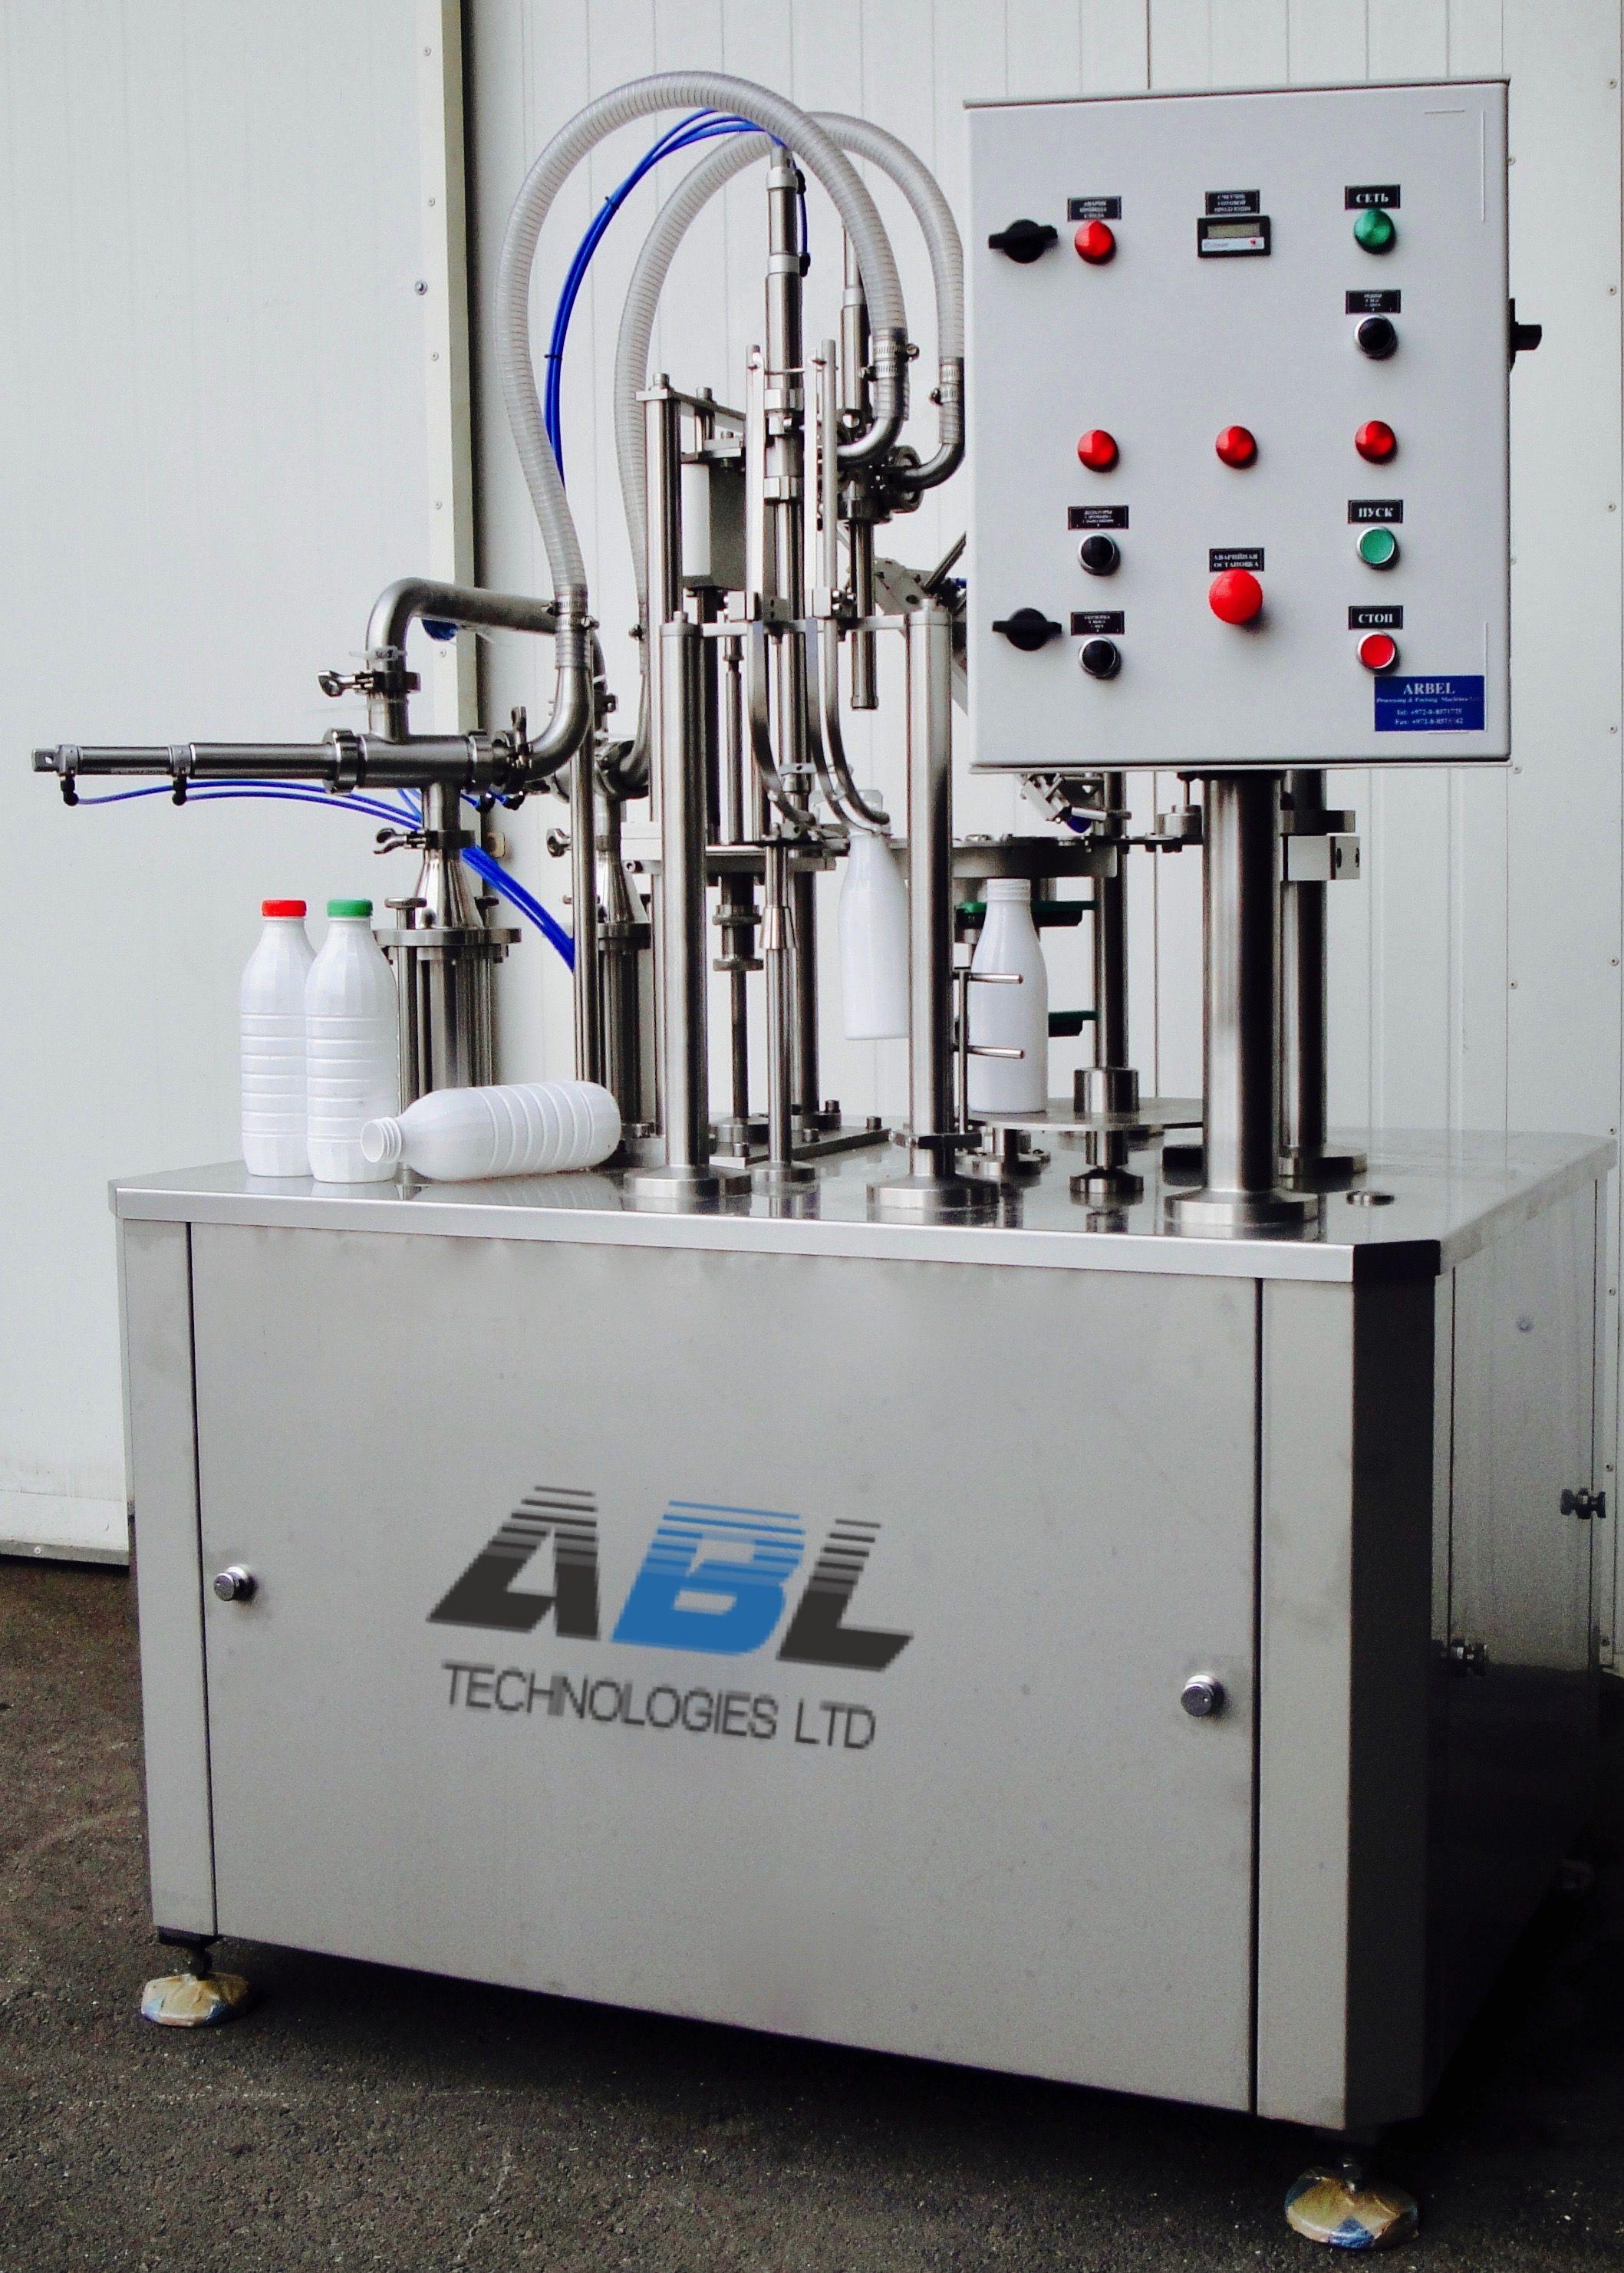 Pin By Abl Technologies Ltd On Bottle Filling Machine Milk